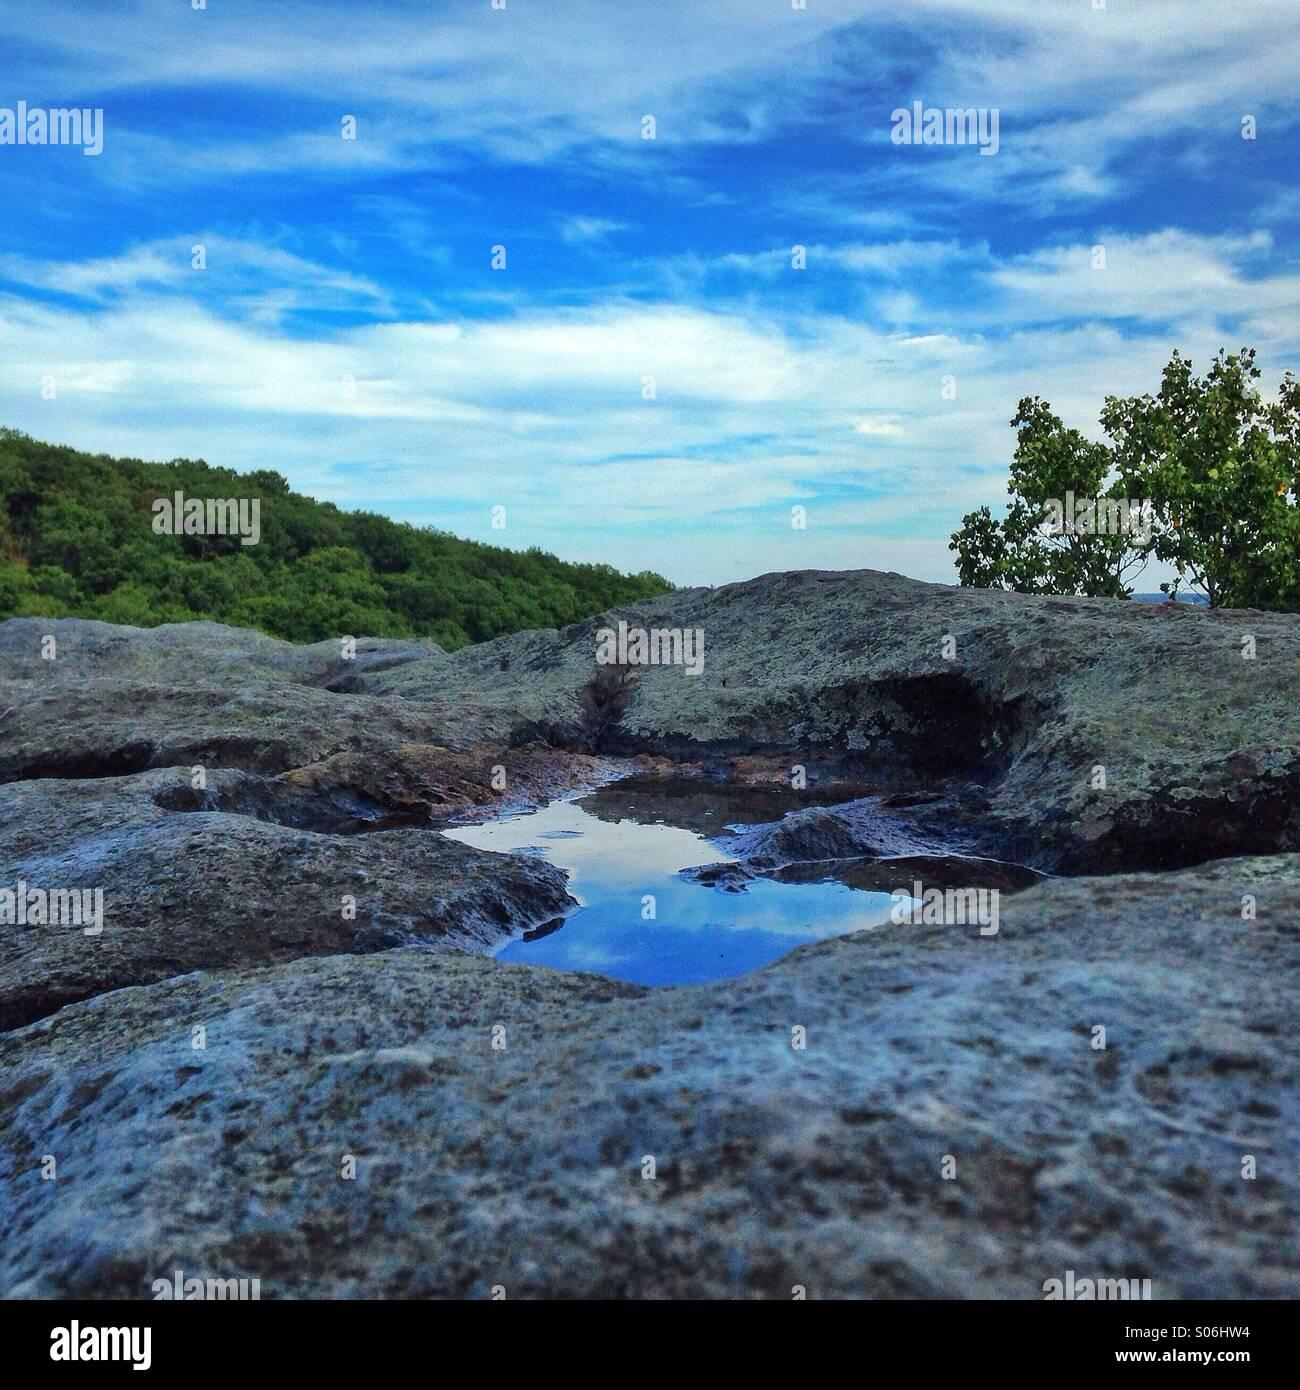 Little sky, big sky at Rock State Park Maryland. - Stock Image